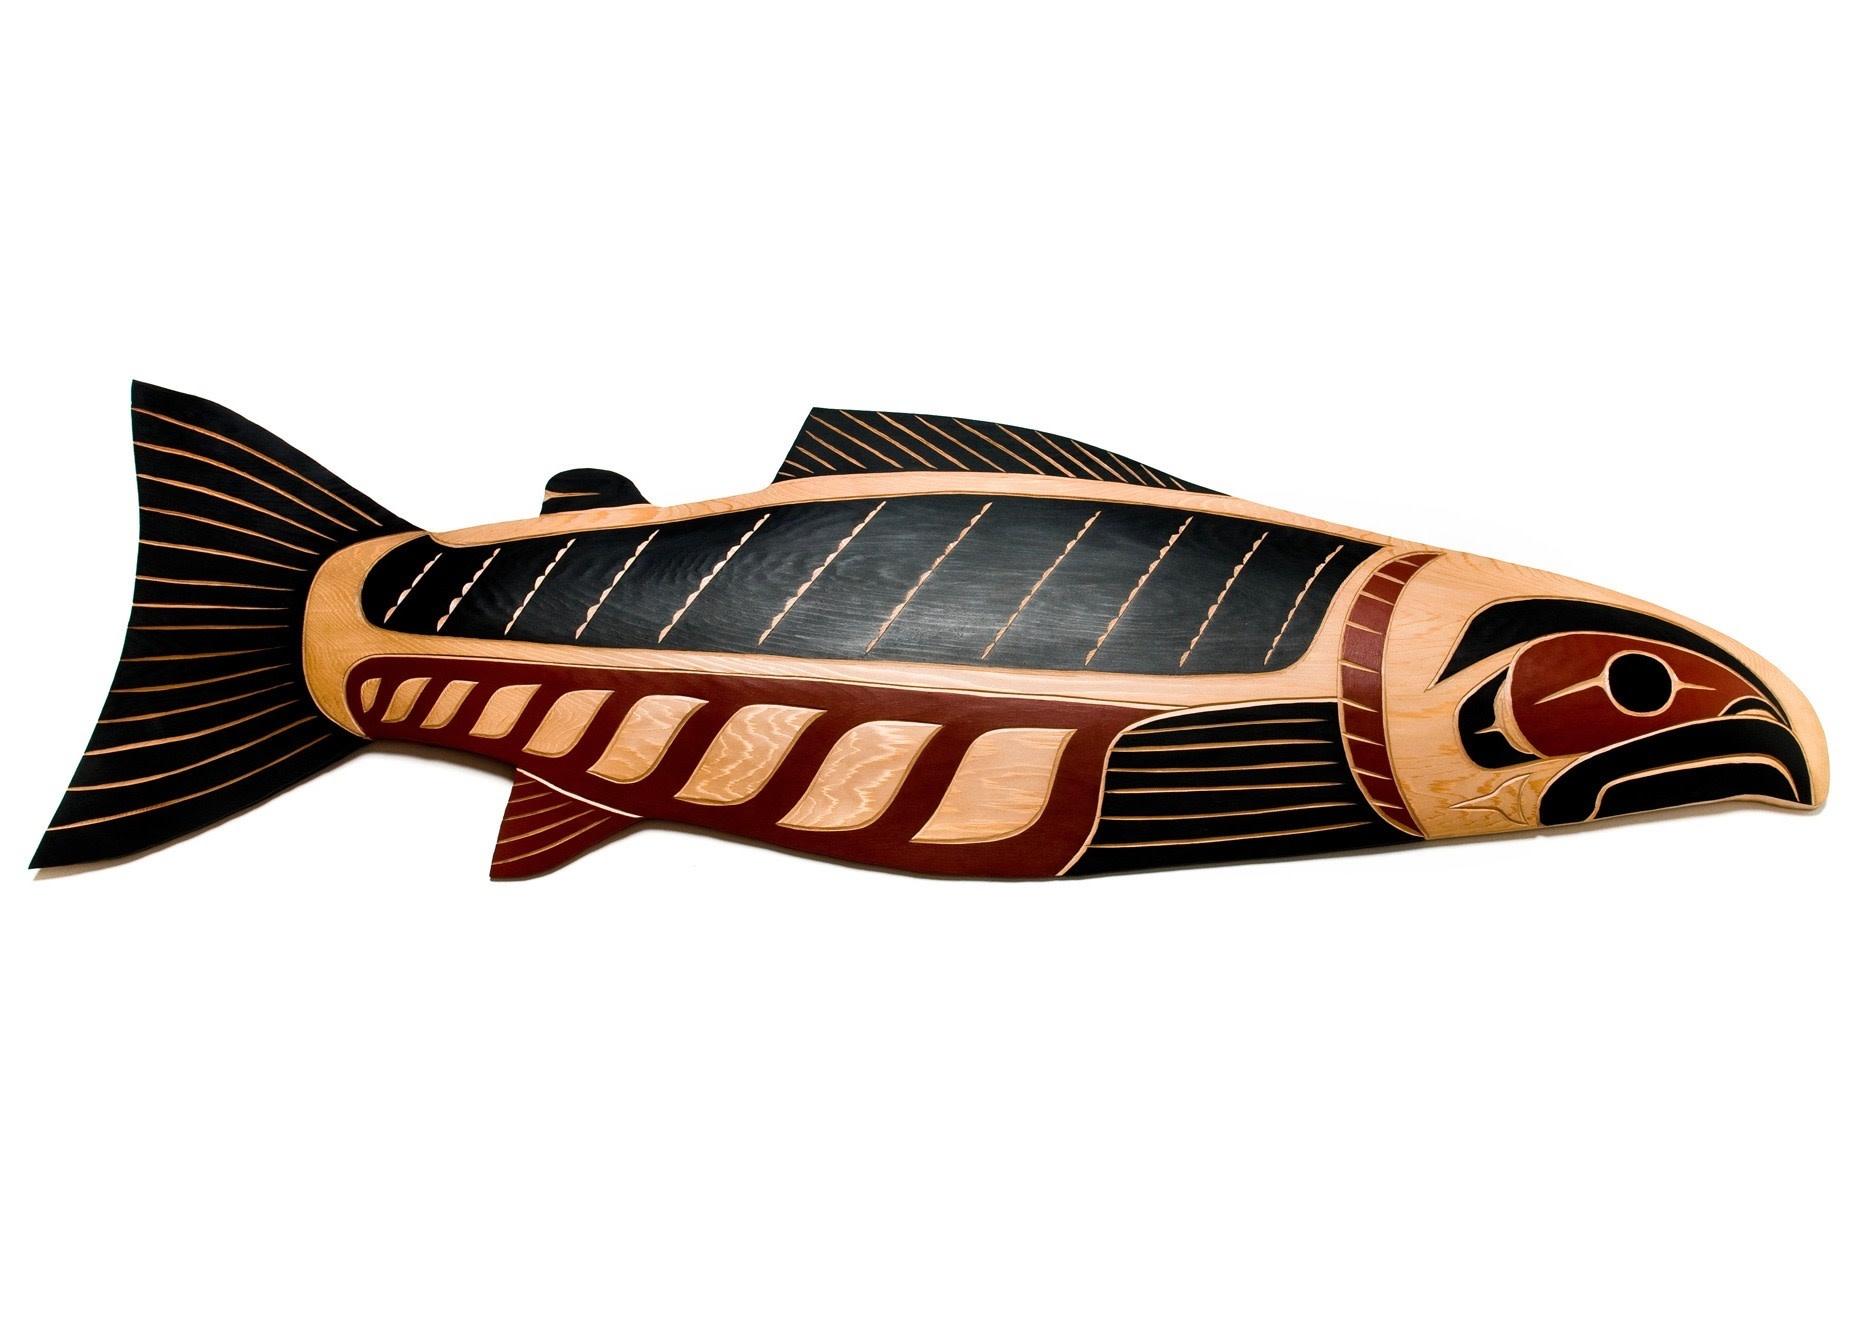 4' Salmon Plaque by David Louis Jr.